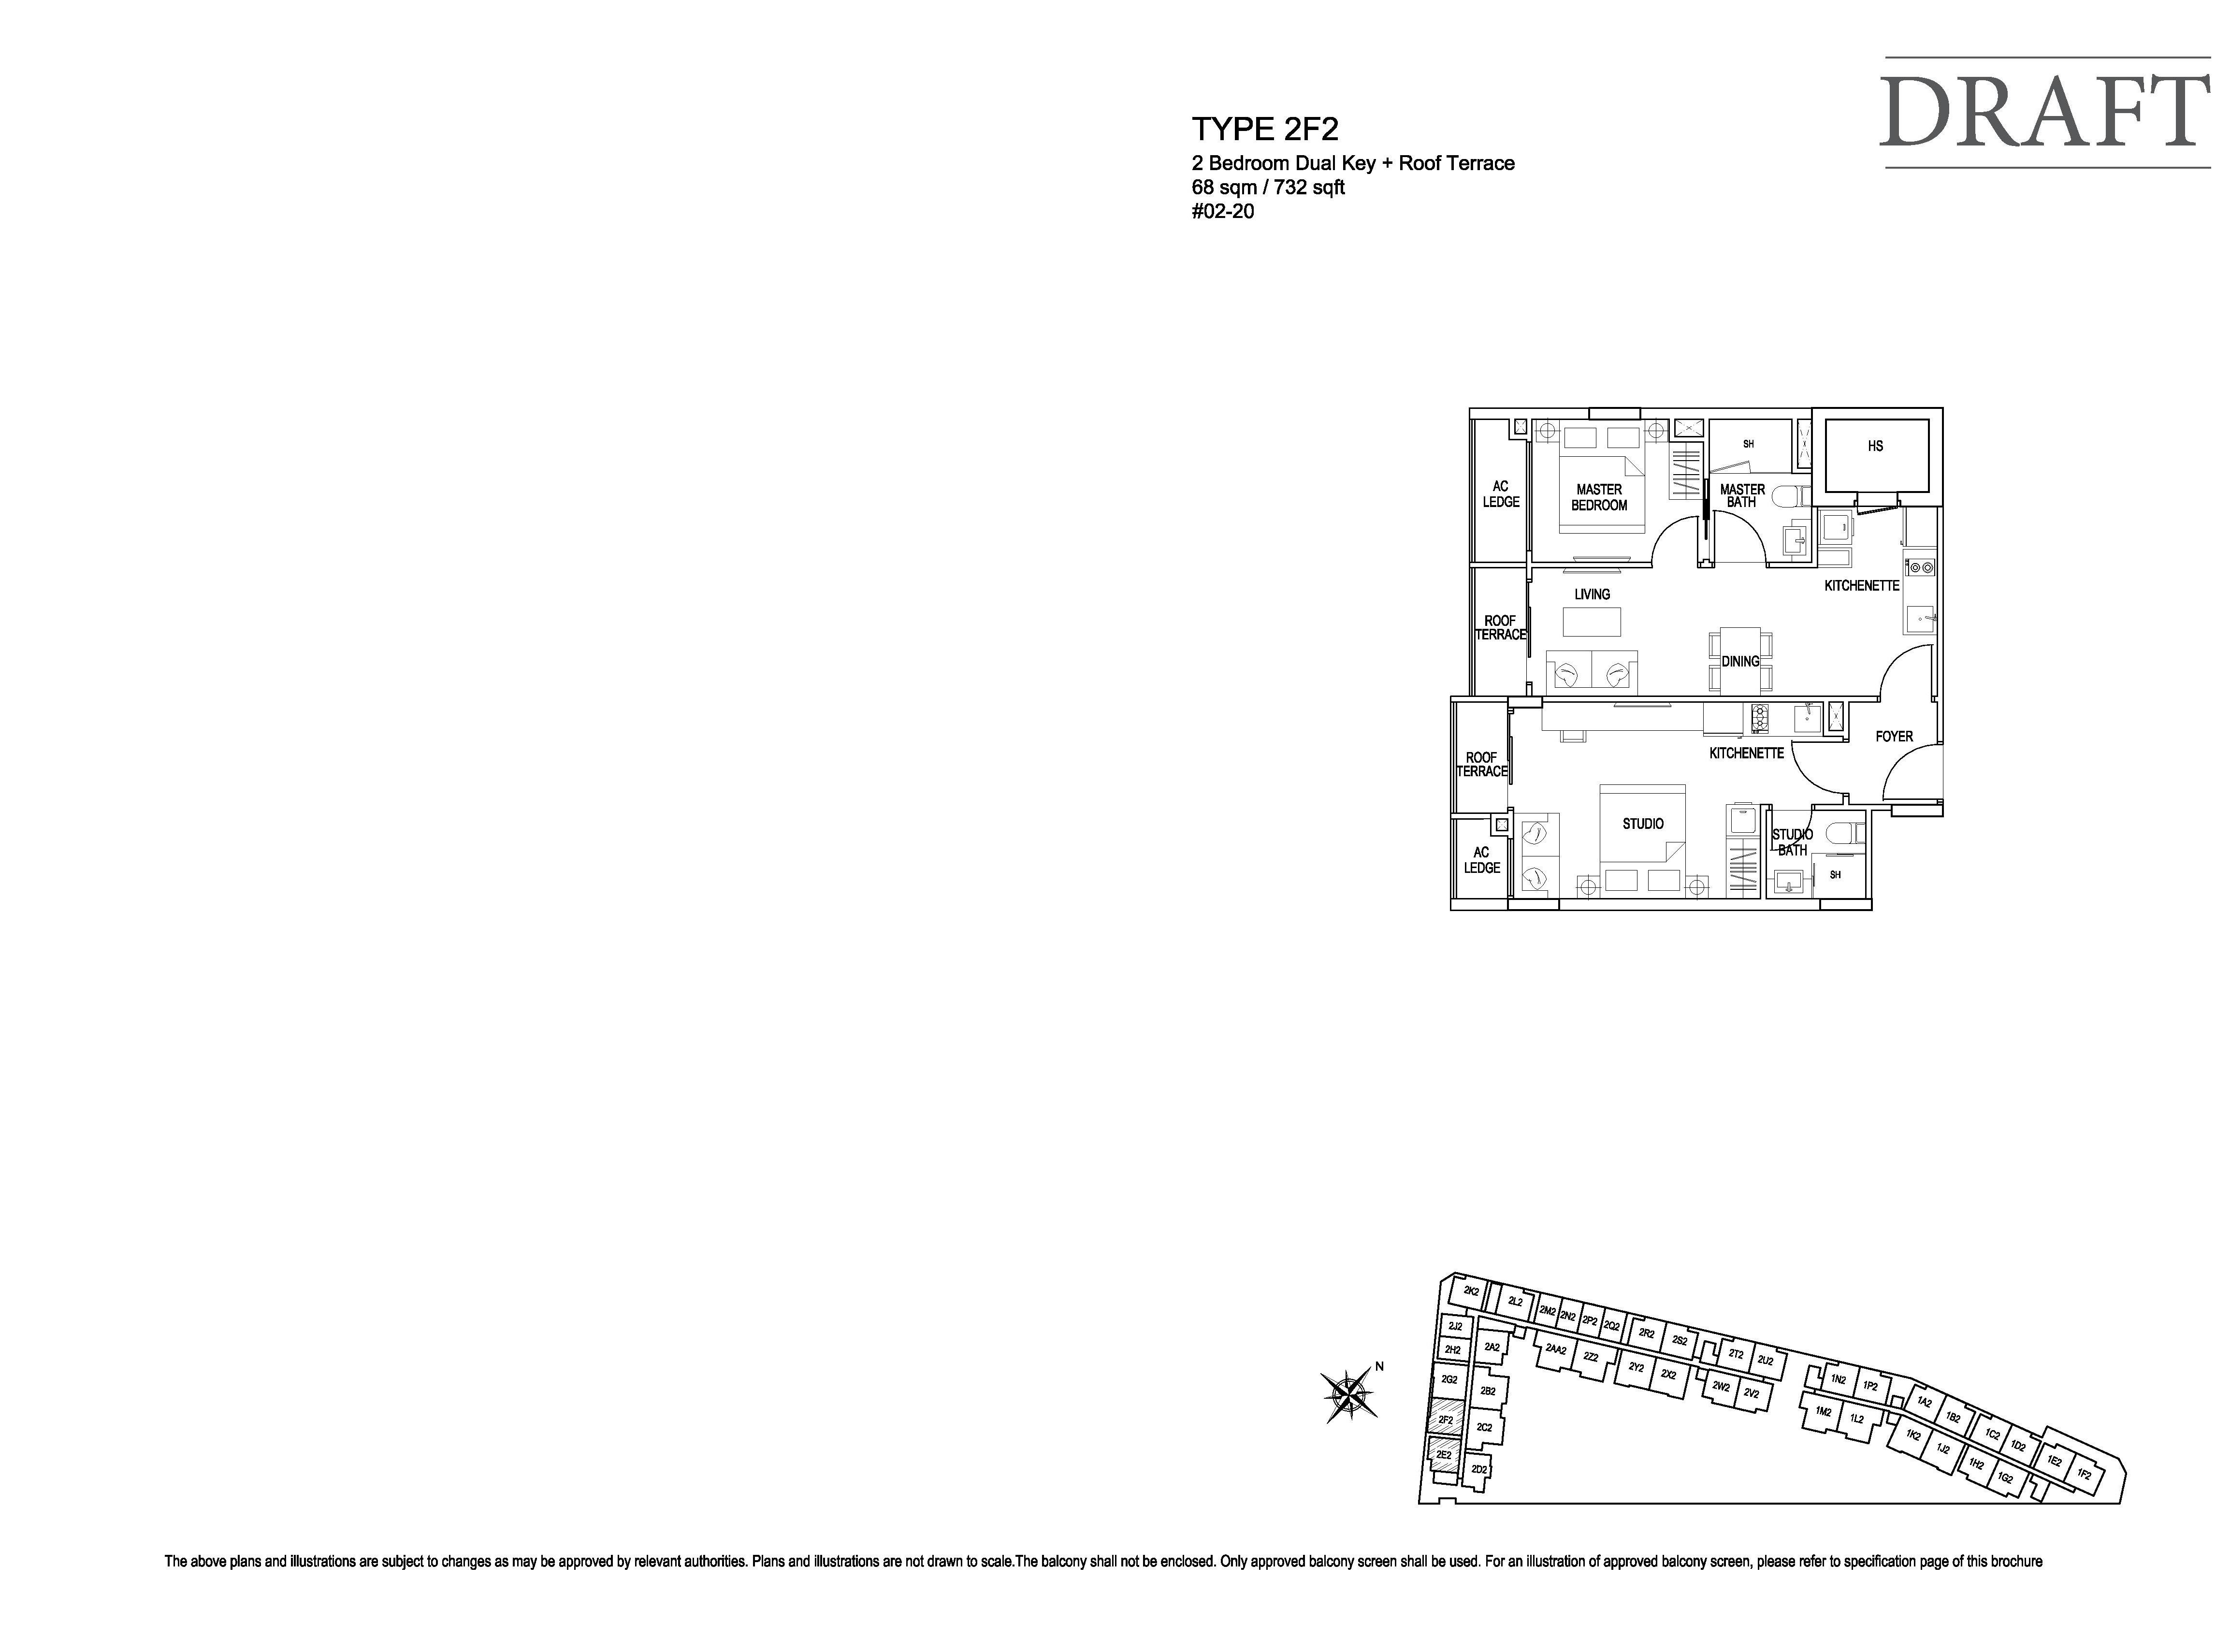 Kensington Square 2 Bedroom Dual Key Floor Plans Type 2F2